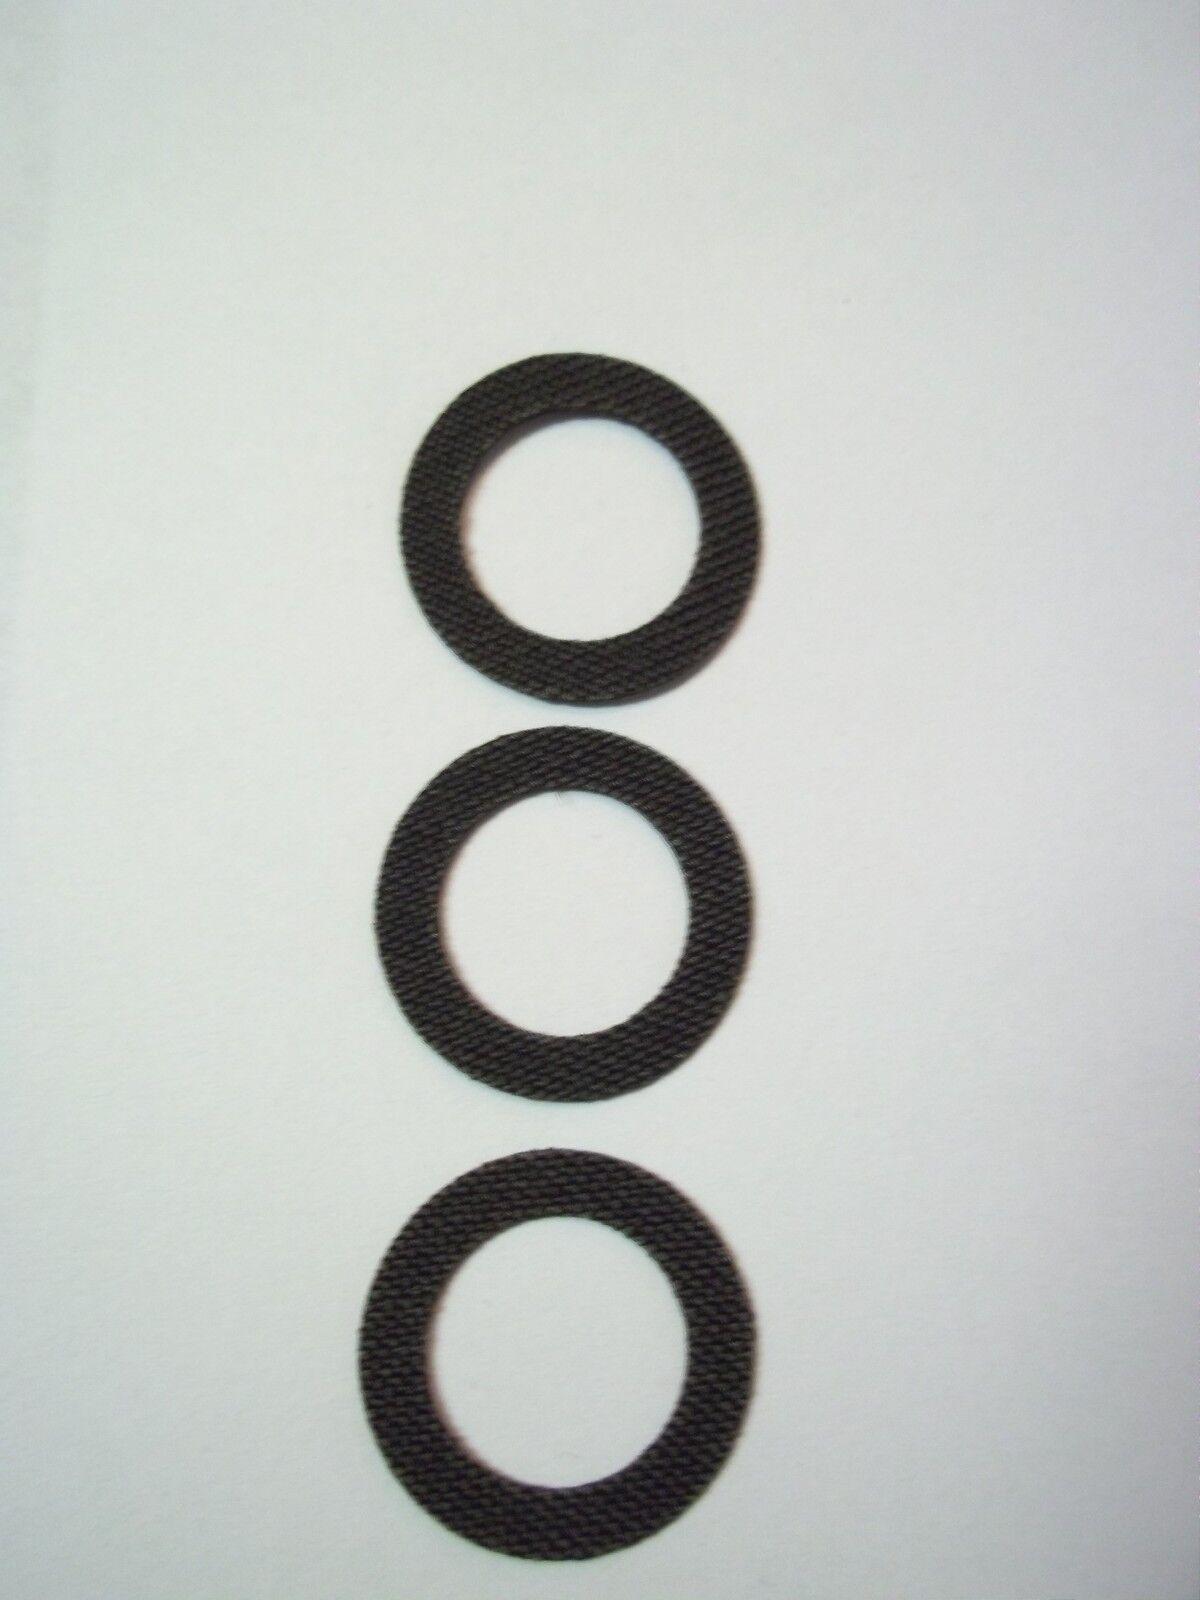 3000FA 4000FA CD71 Smoothdrag Carbon Drag Shimano Saros 2500FA